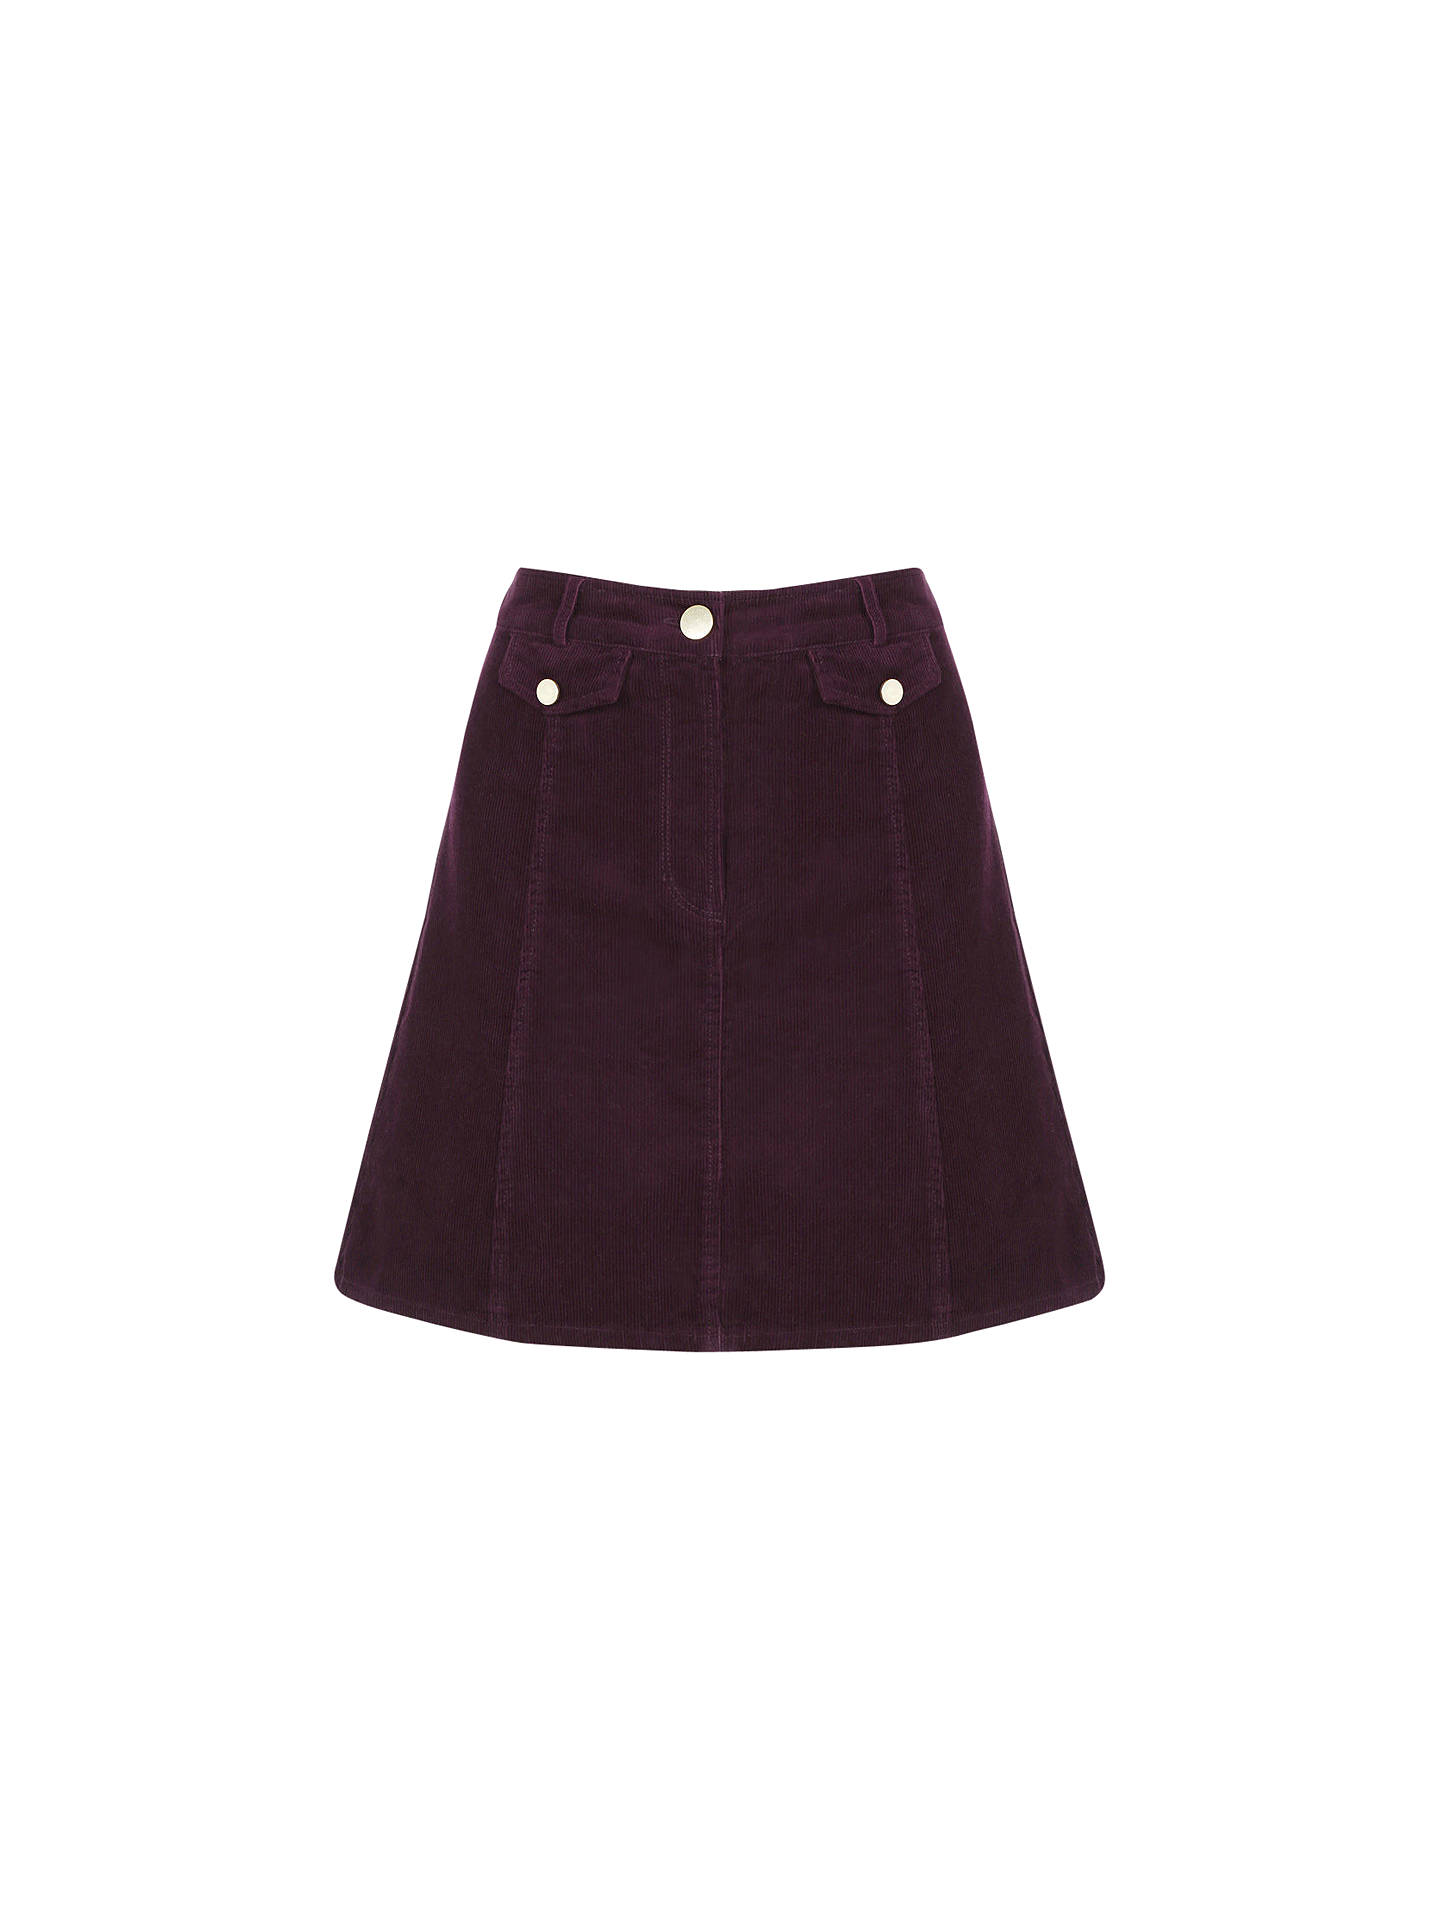 94f5fa065 Buy Oasis Cord Pocket Mini Skirt, Burgundy, 8 Online at johnlewis.com ...